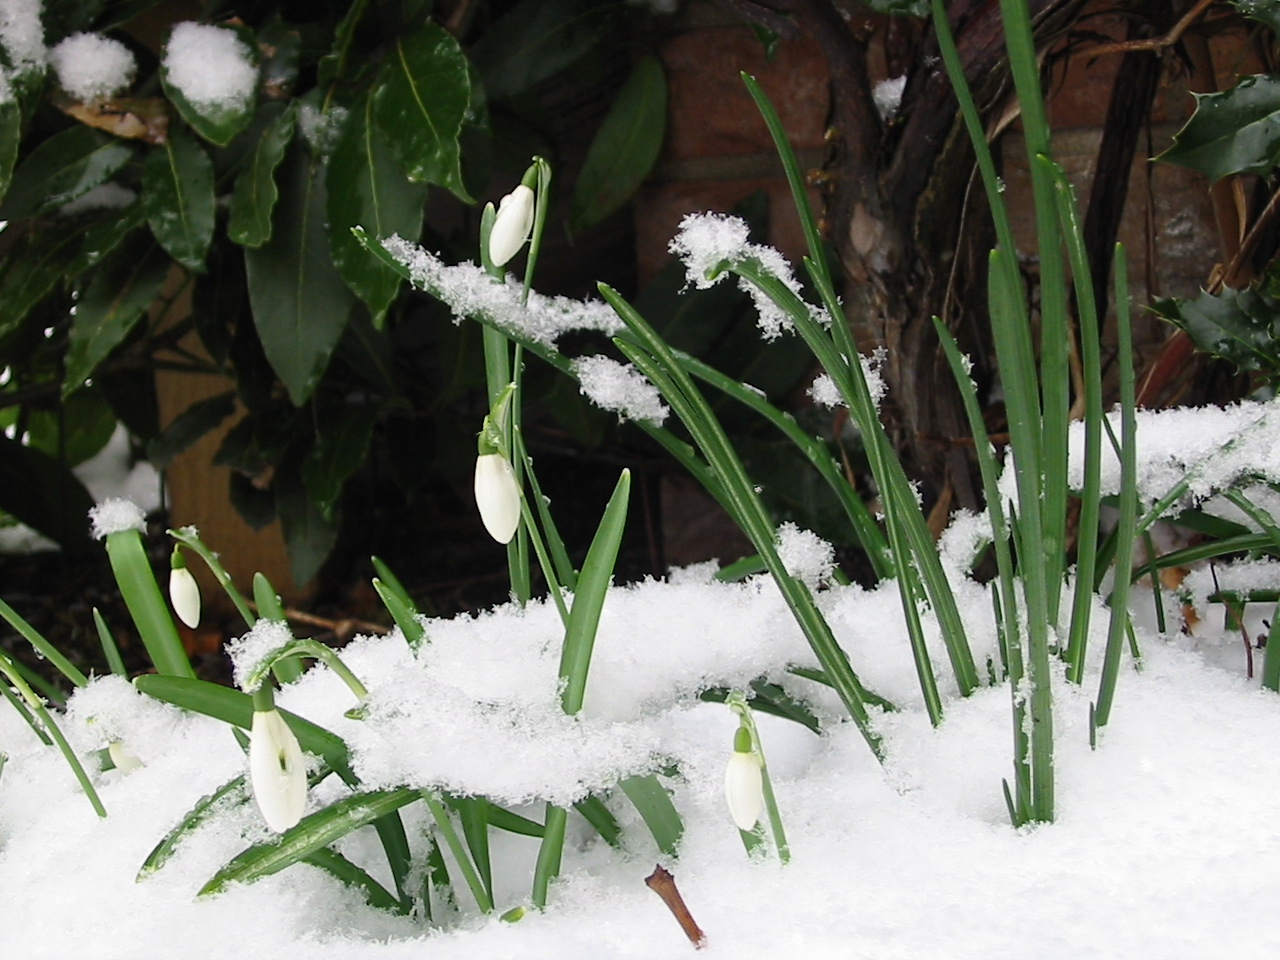 http://3.bp.blogspot.com/_fuVkEdeAoGA/TUp1ClhrvmI/AAAAAAAAATk/Ul8hNLa37us/s1600/Snowdrop.jpg